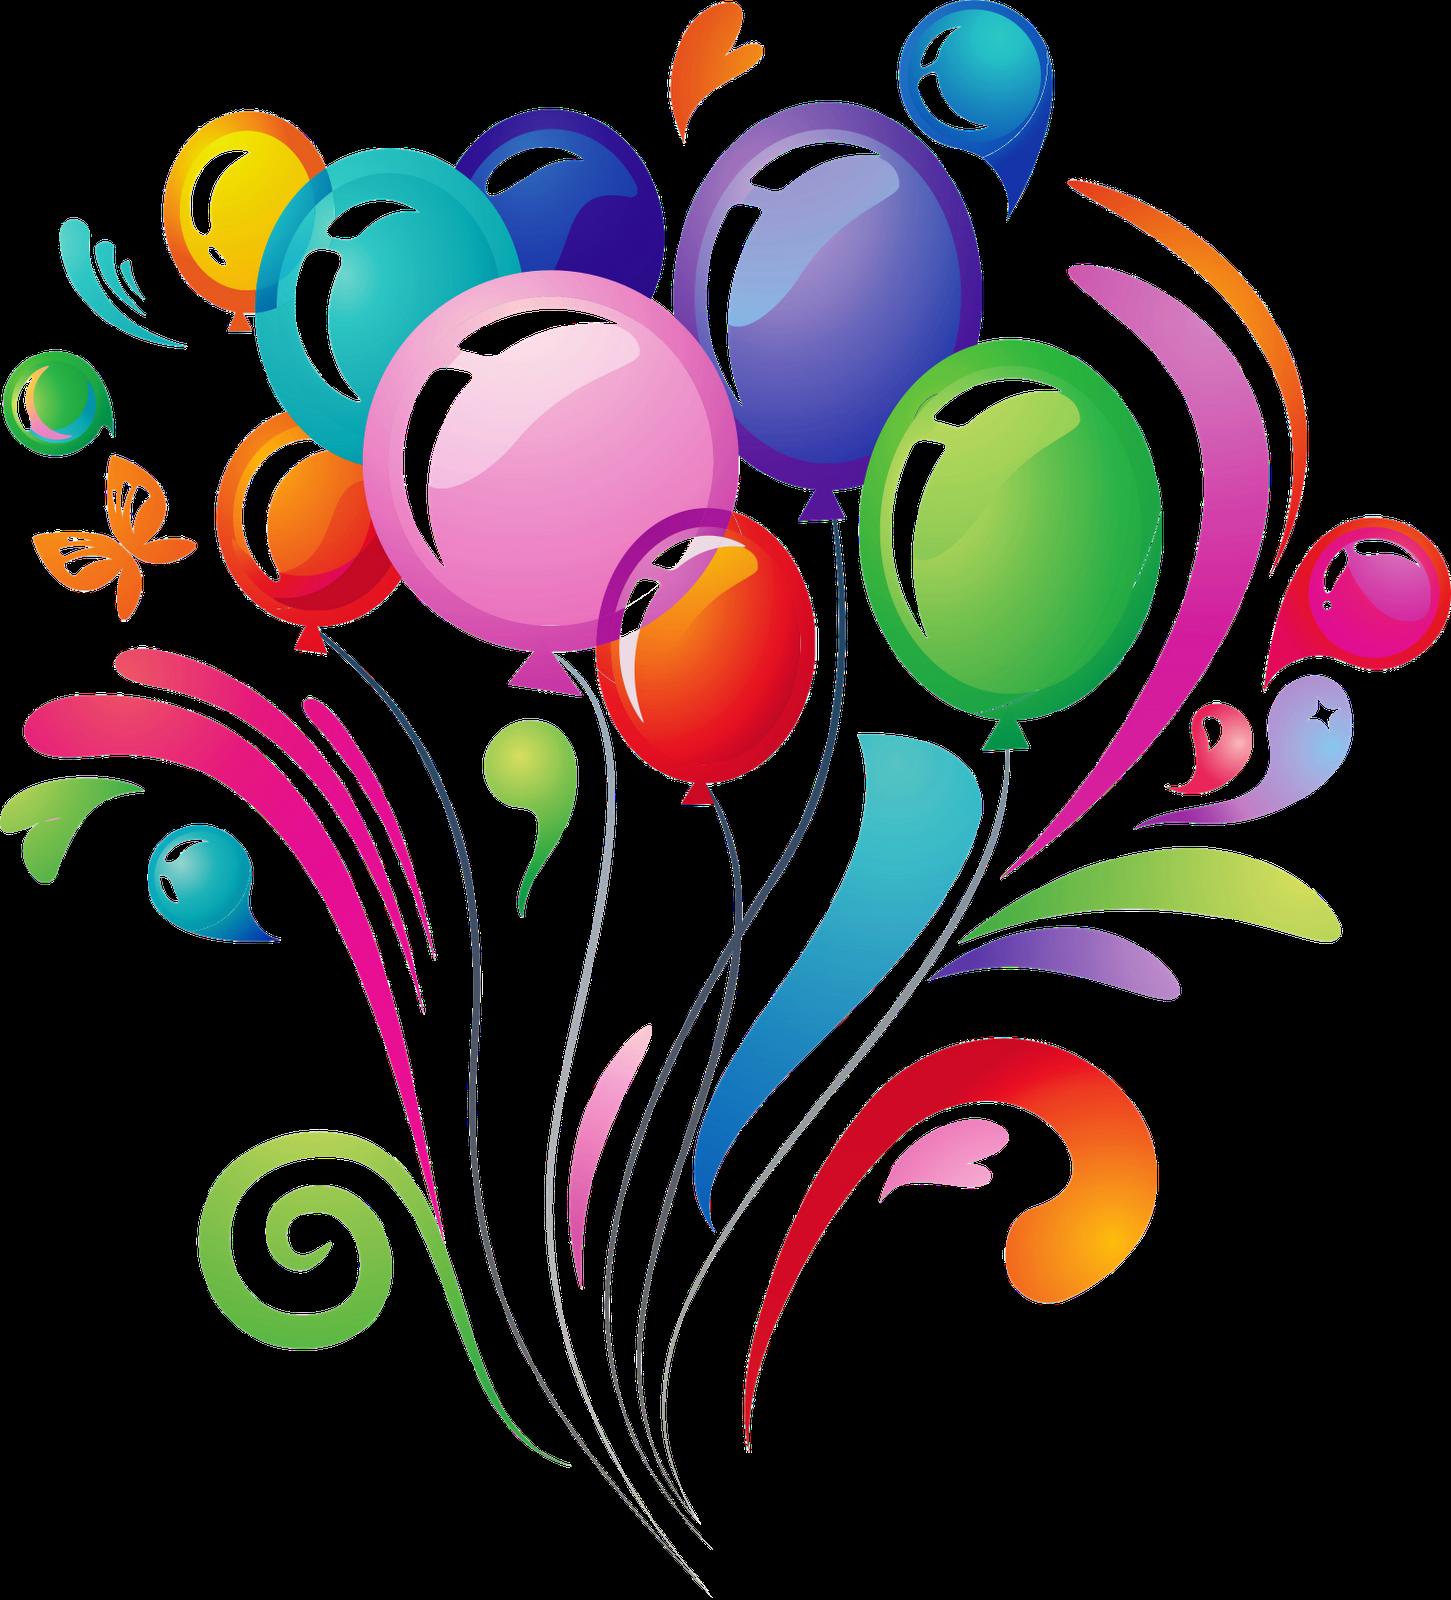 clipart transparent stock Vector balloon real. Transparent birthday balloons clipart